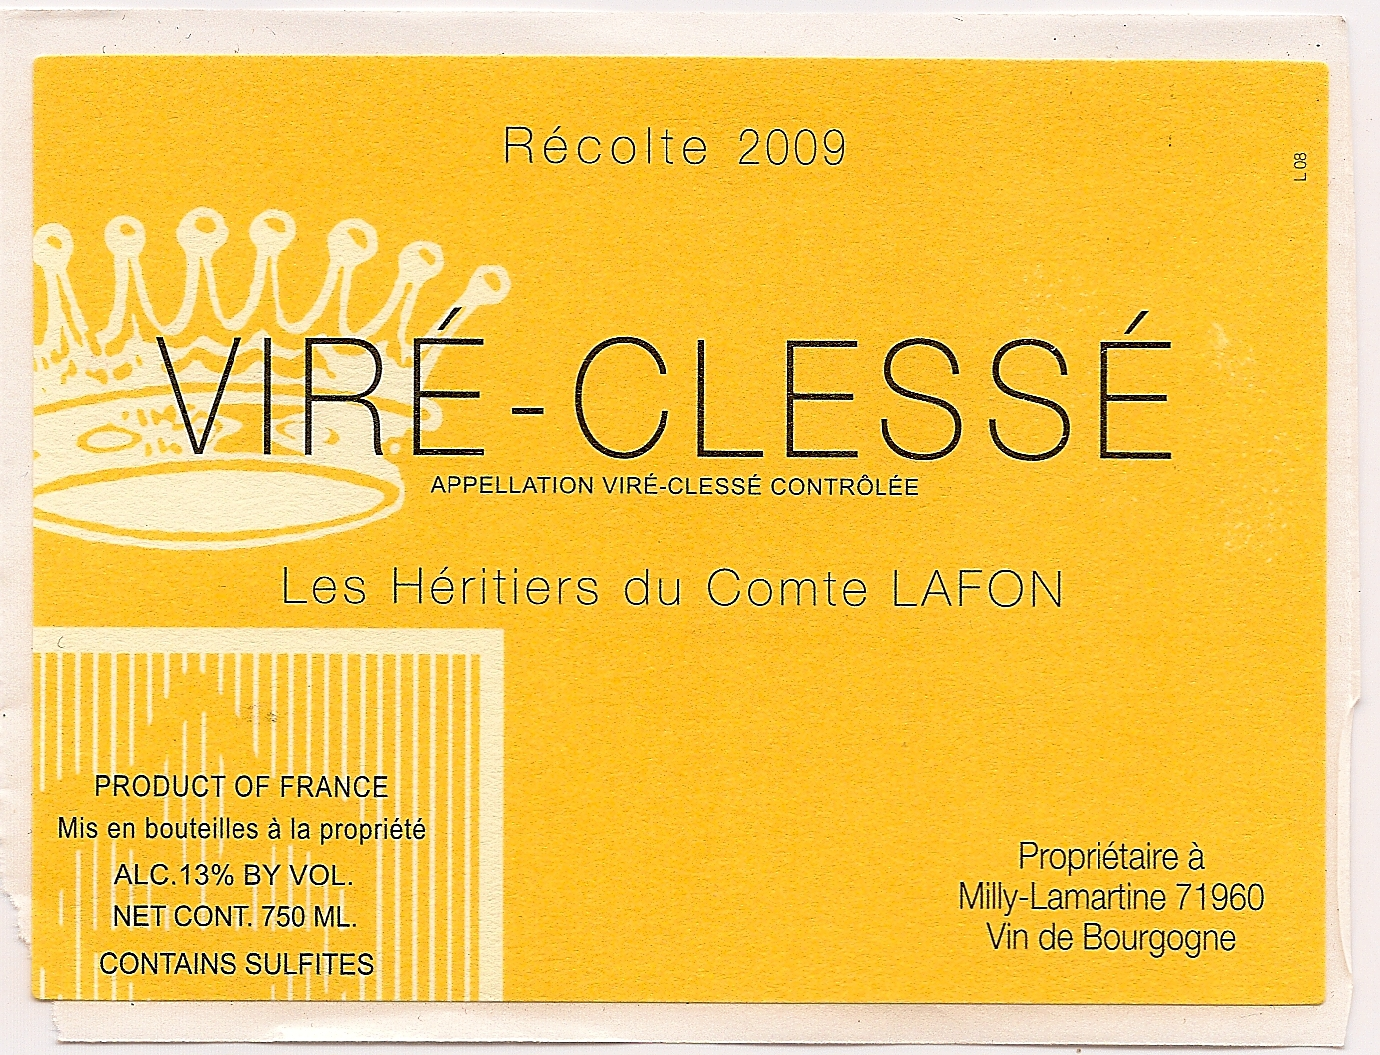 2011 Heritiers du Comte Lafon Vire Clesse